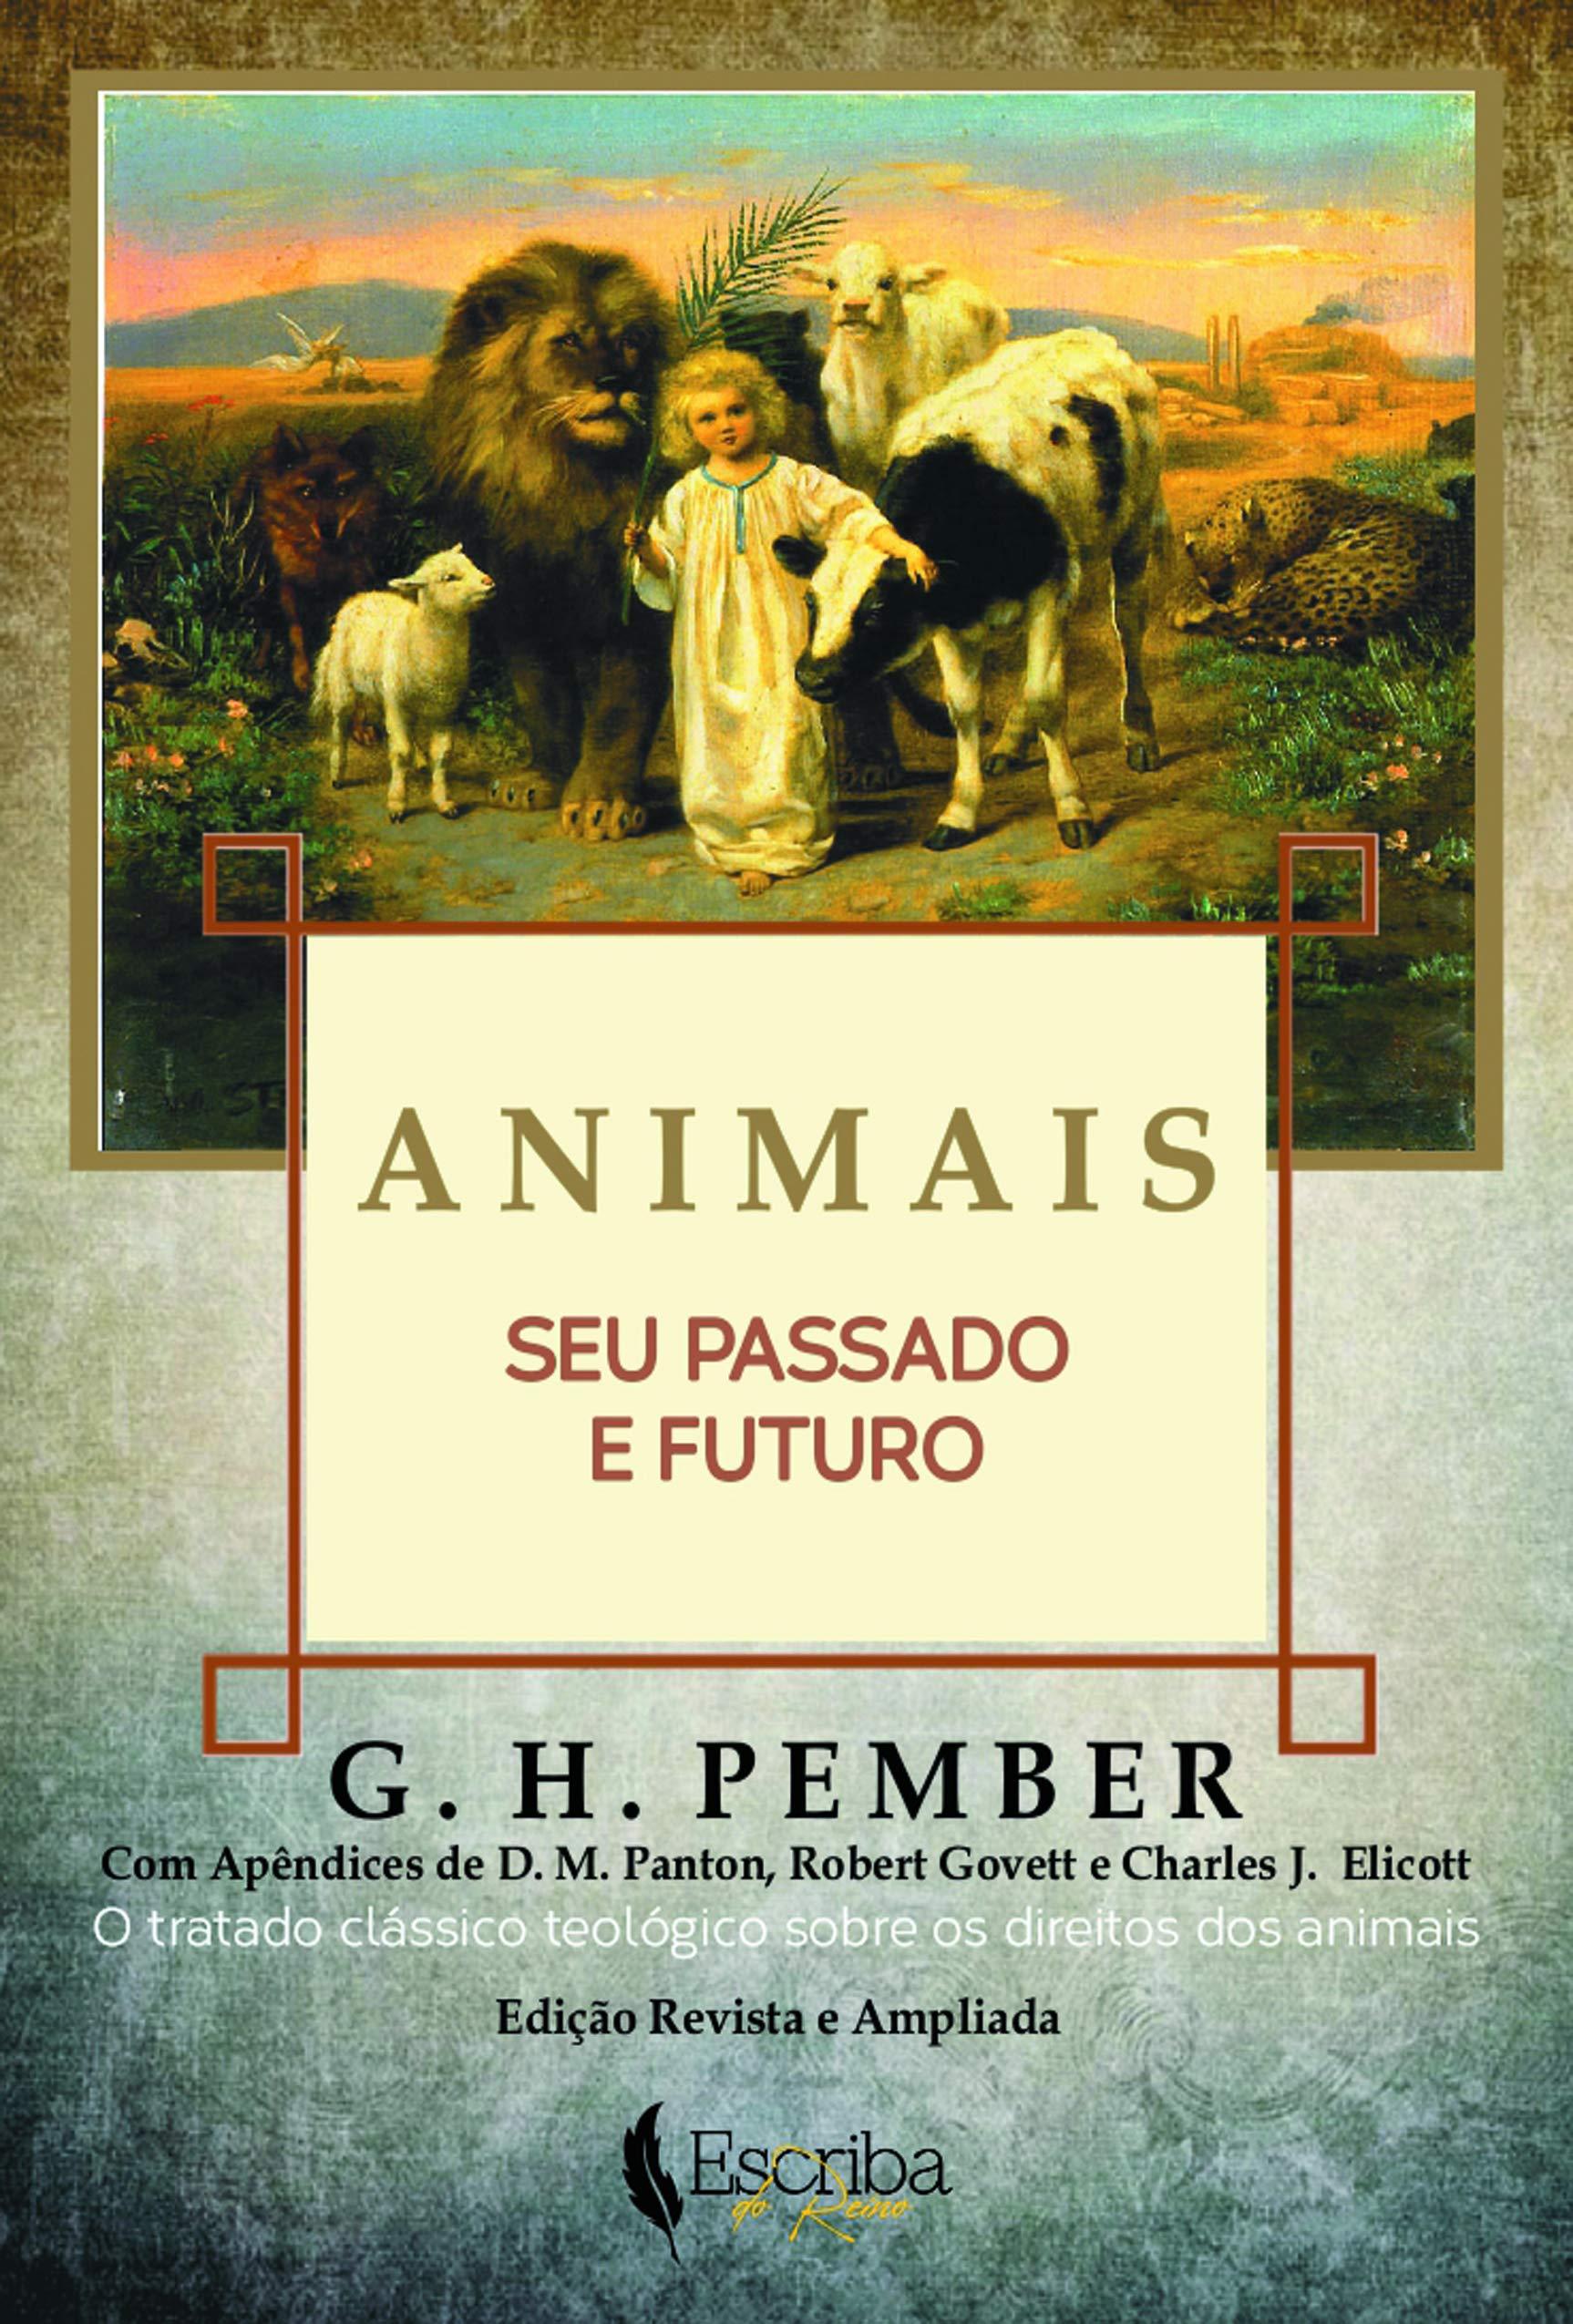 Animais - Seu Passado e Futuro - 9788571381018 - Livros na Amazon Brasil